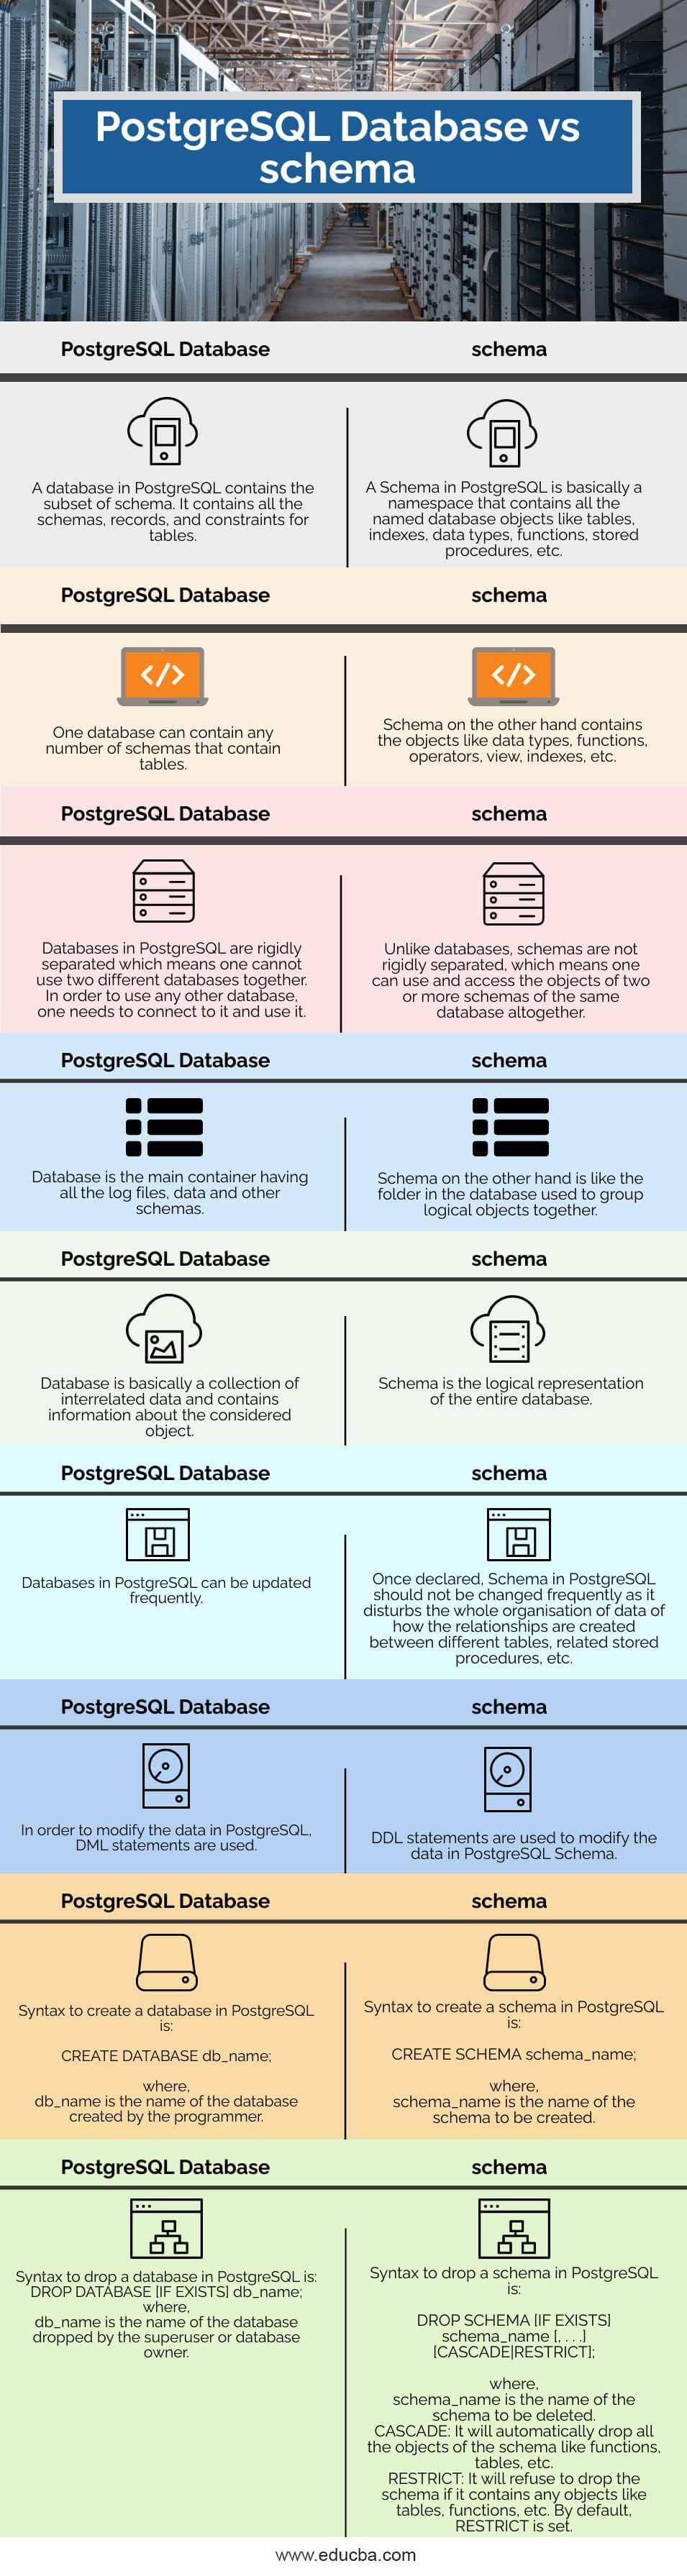 PostgreSQL-Database-vs-schema-info